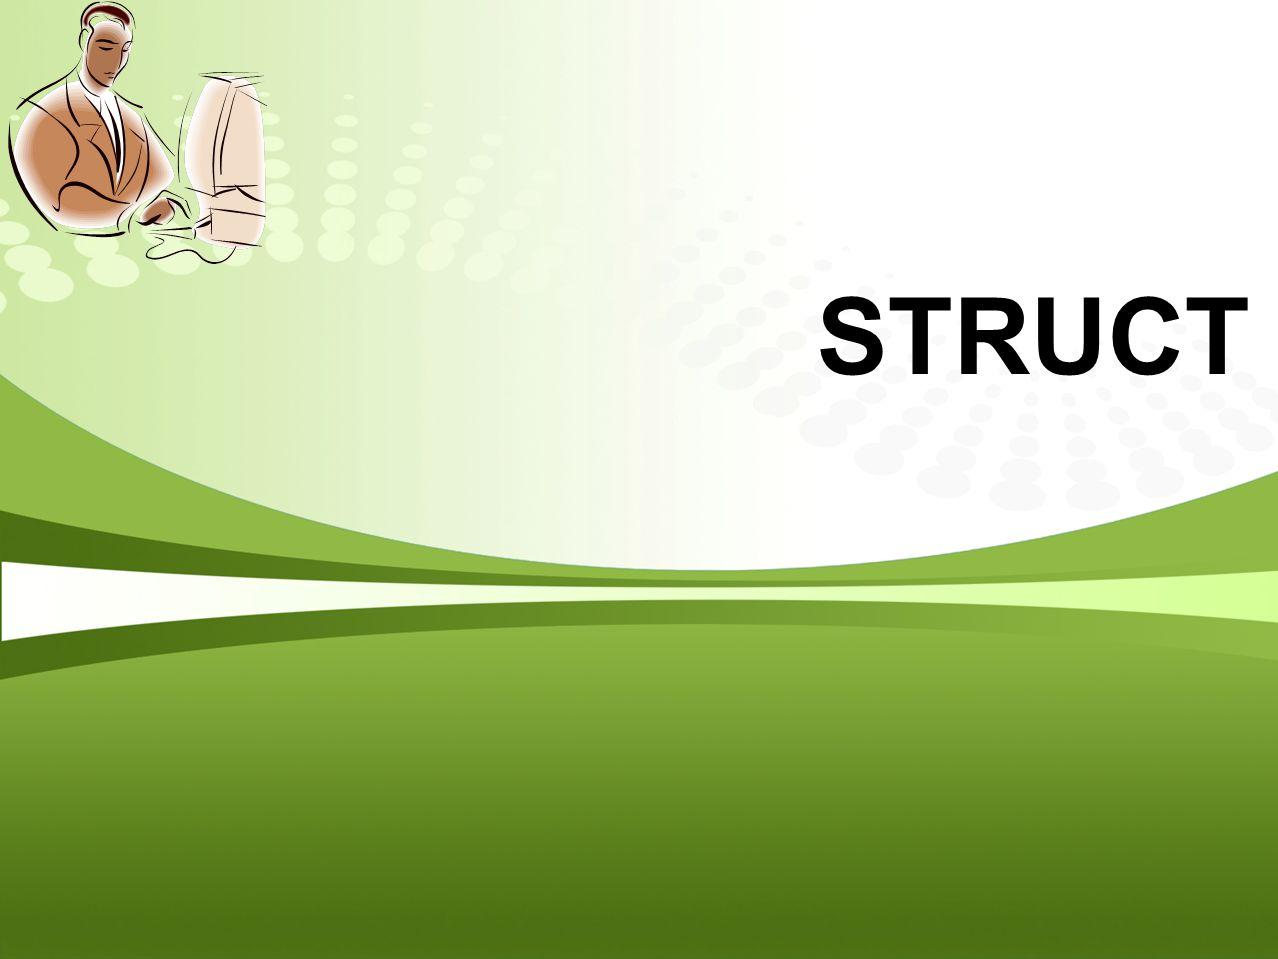 Page  2 STRUCT (Tipe Terstruktur)  Struct adalah tipe data bentukan yang berisi kumpulan variabel-variabel yang bernaung dalam satu nama yang sama dan memiliki kaitan satu sama lain.